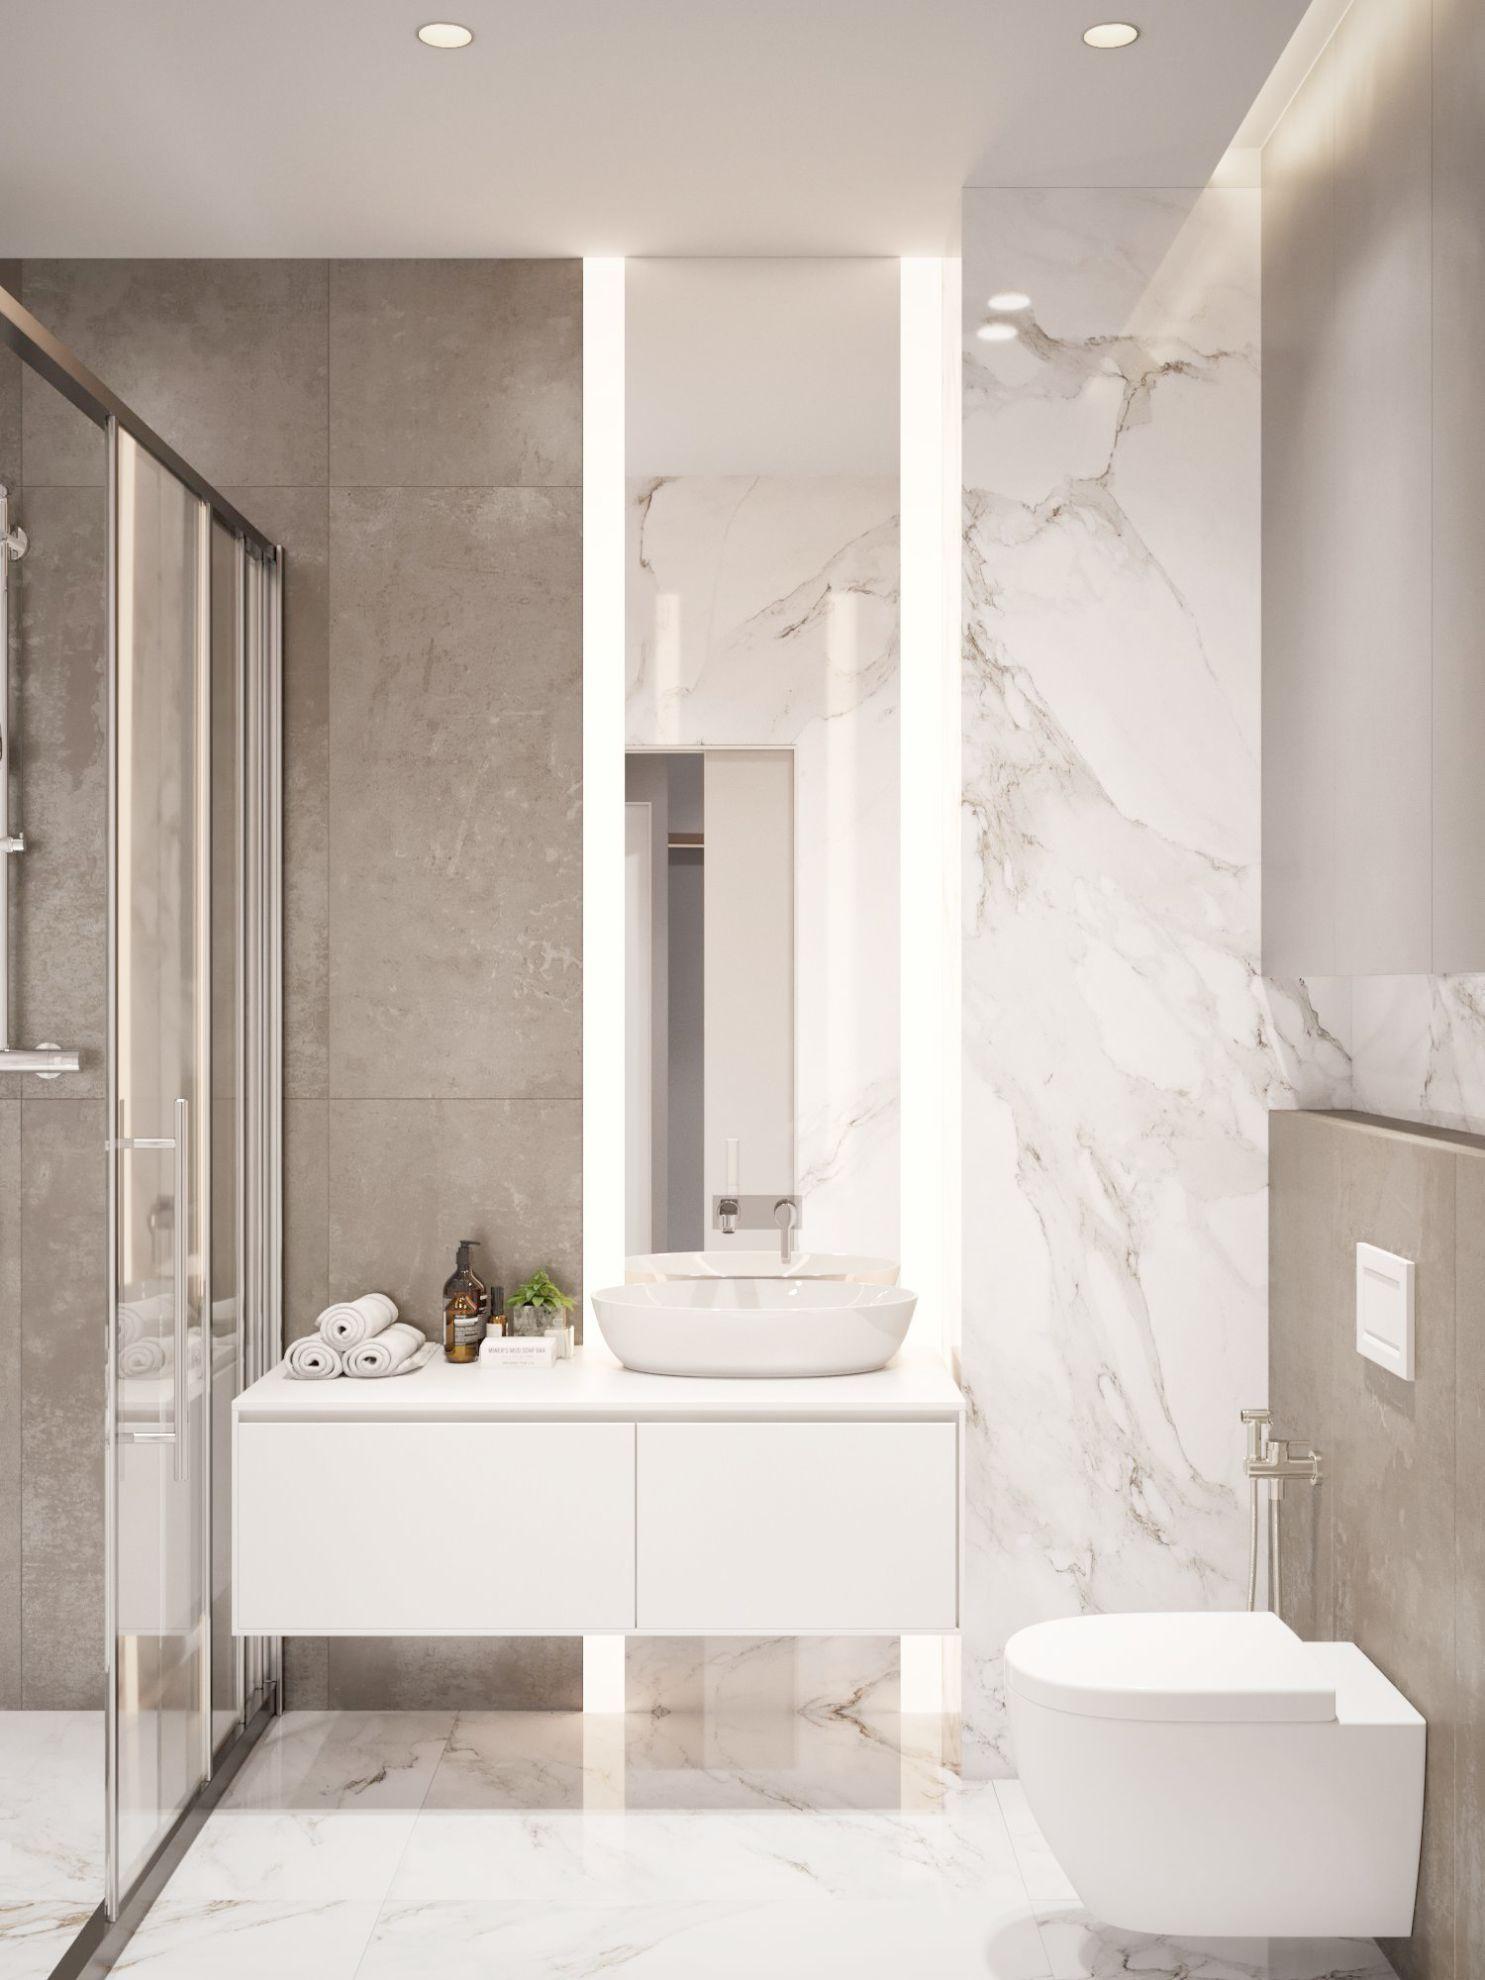 Bathroom Ideas All White their Bathroom Remodel Reviews it ...